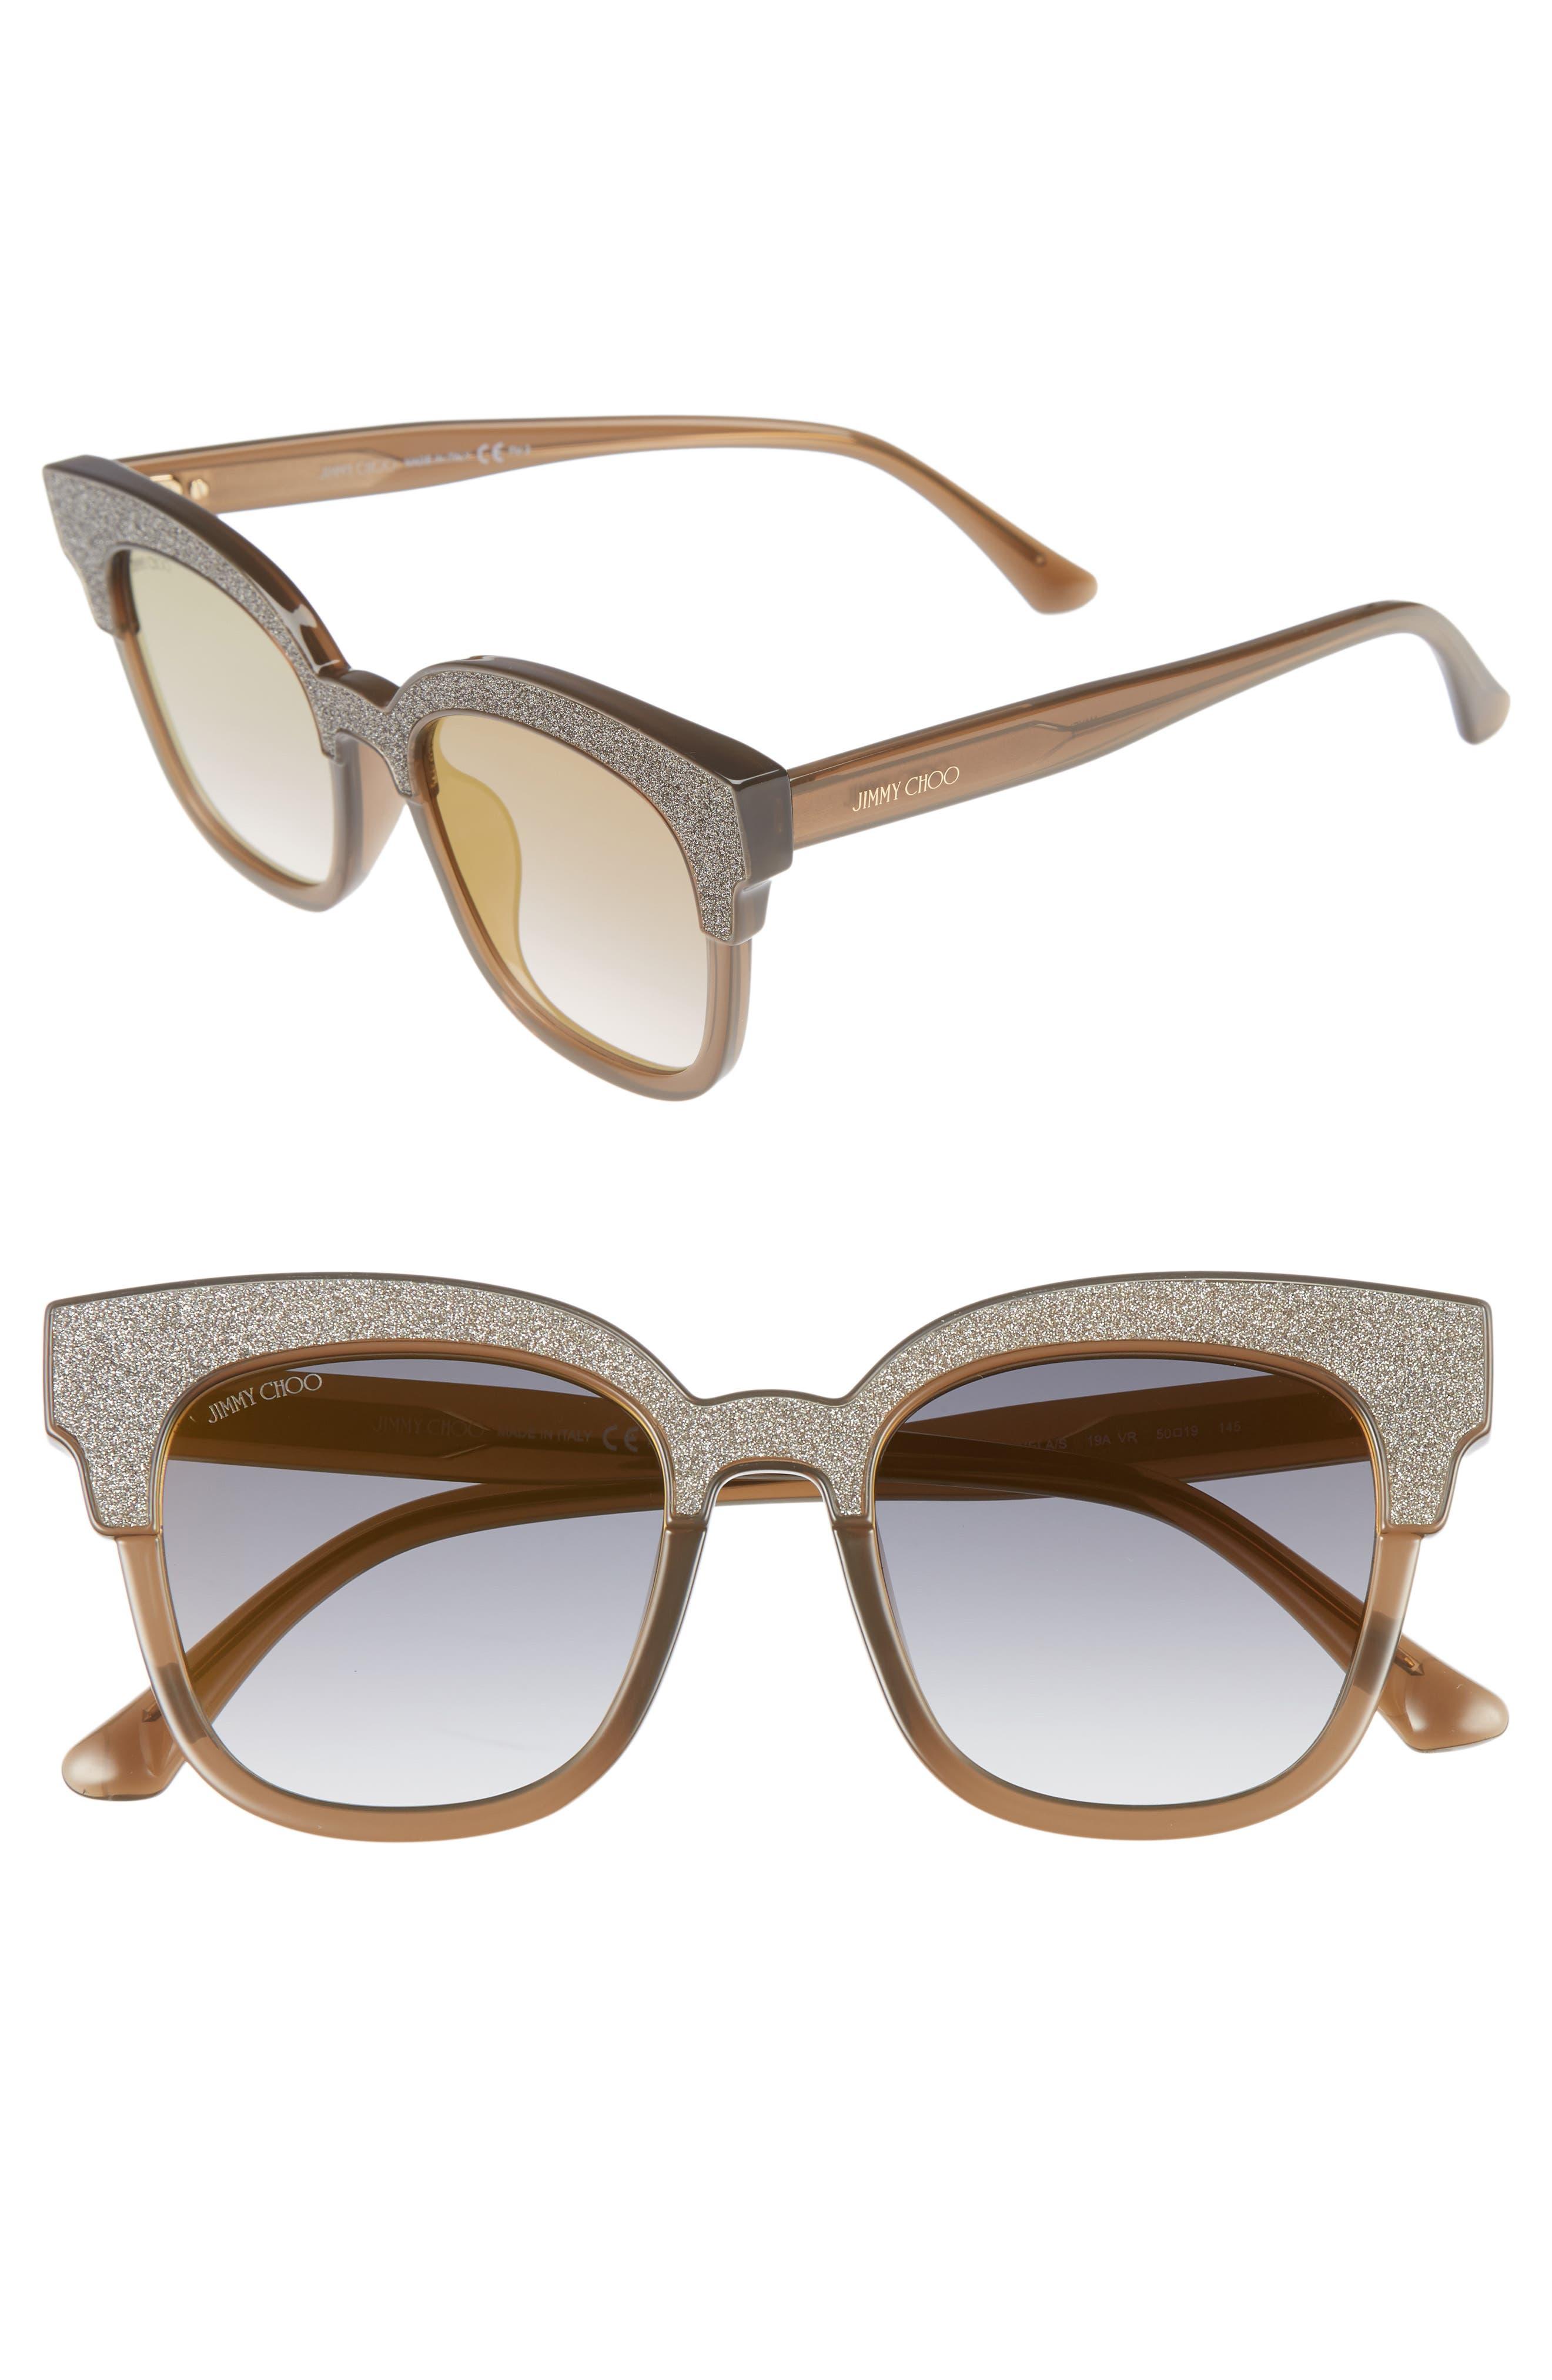 Mayelas 50mm Cat Eye Sunglasses,                         Main,                         color, Brown/ Glitter